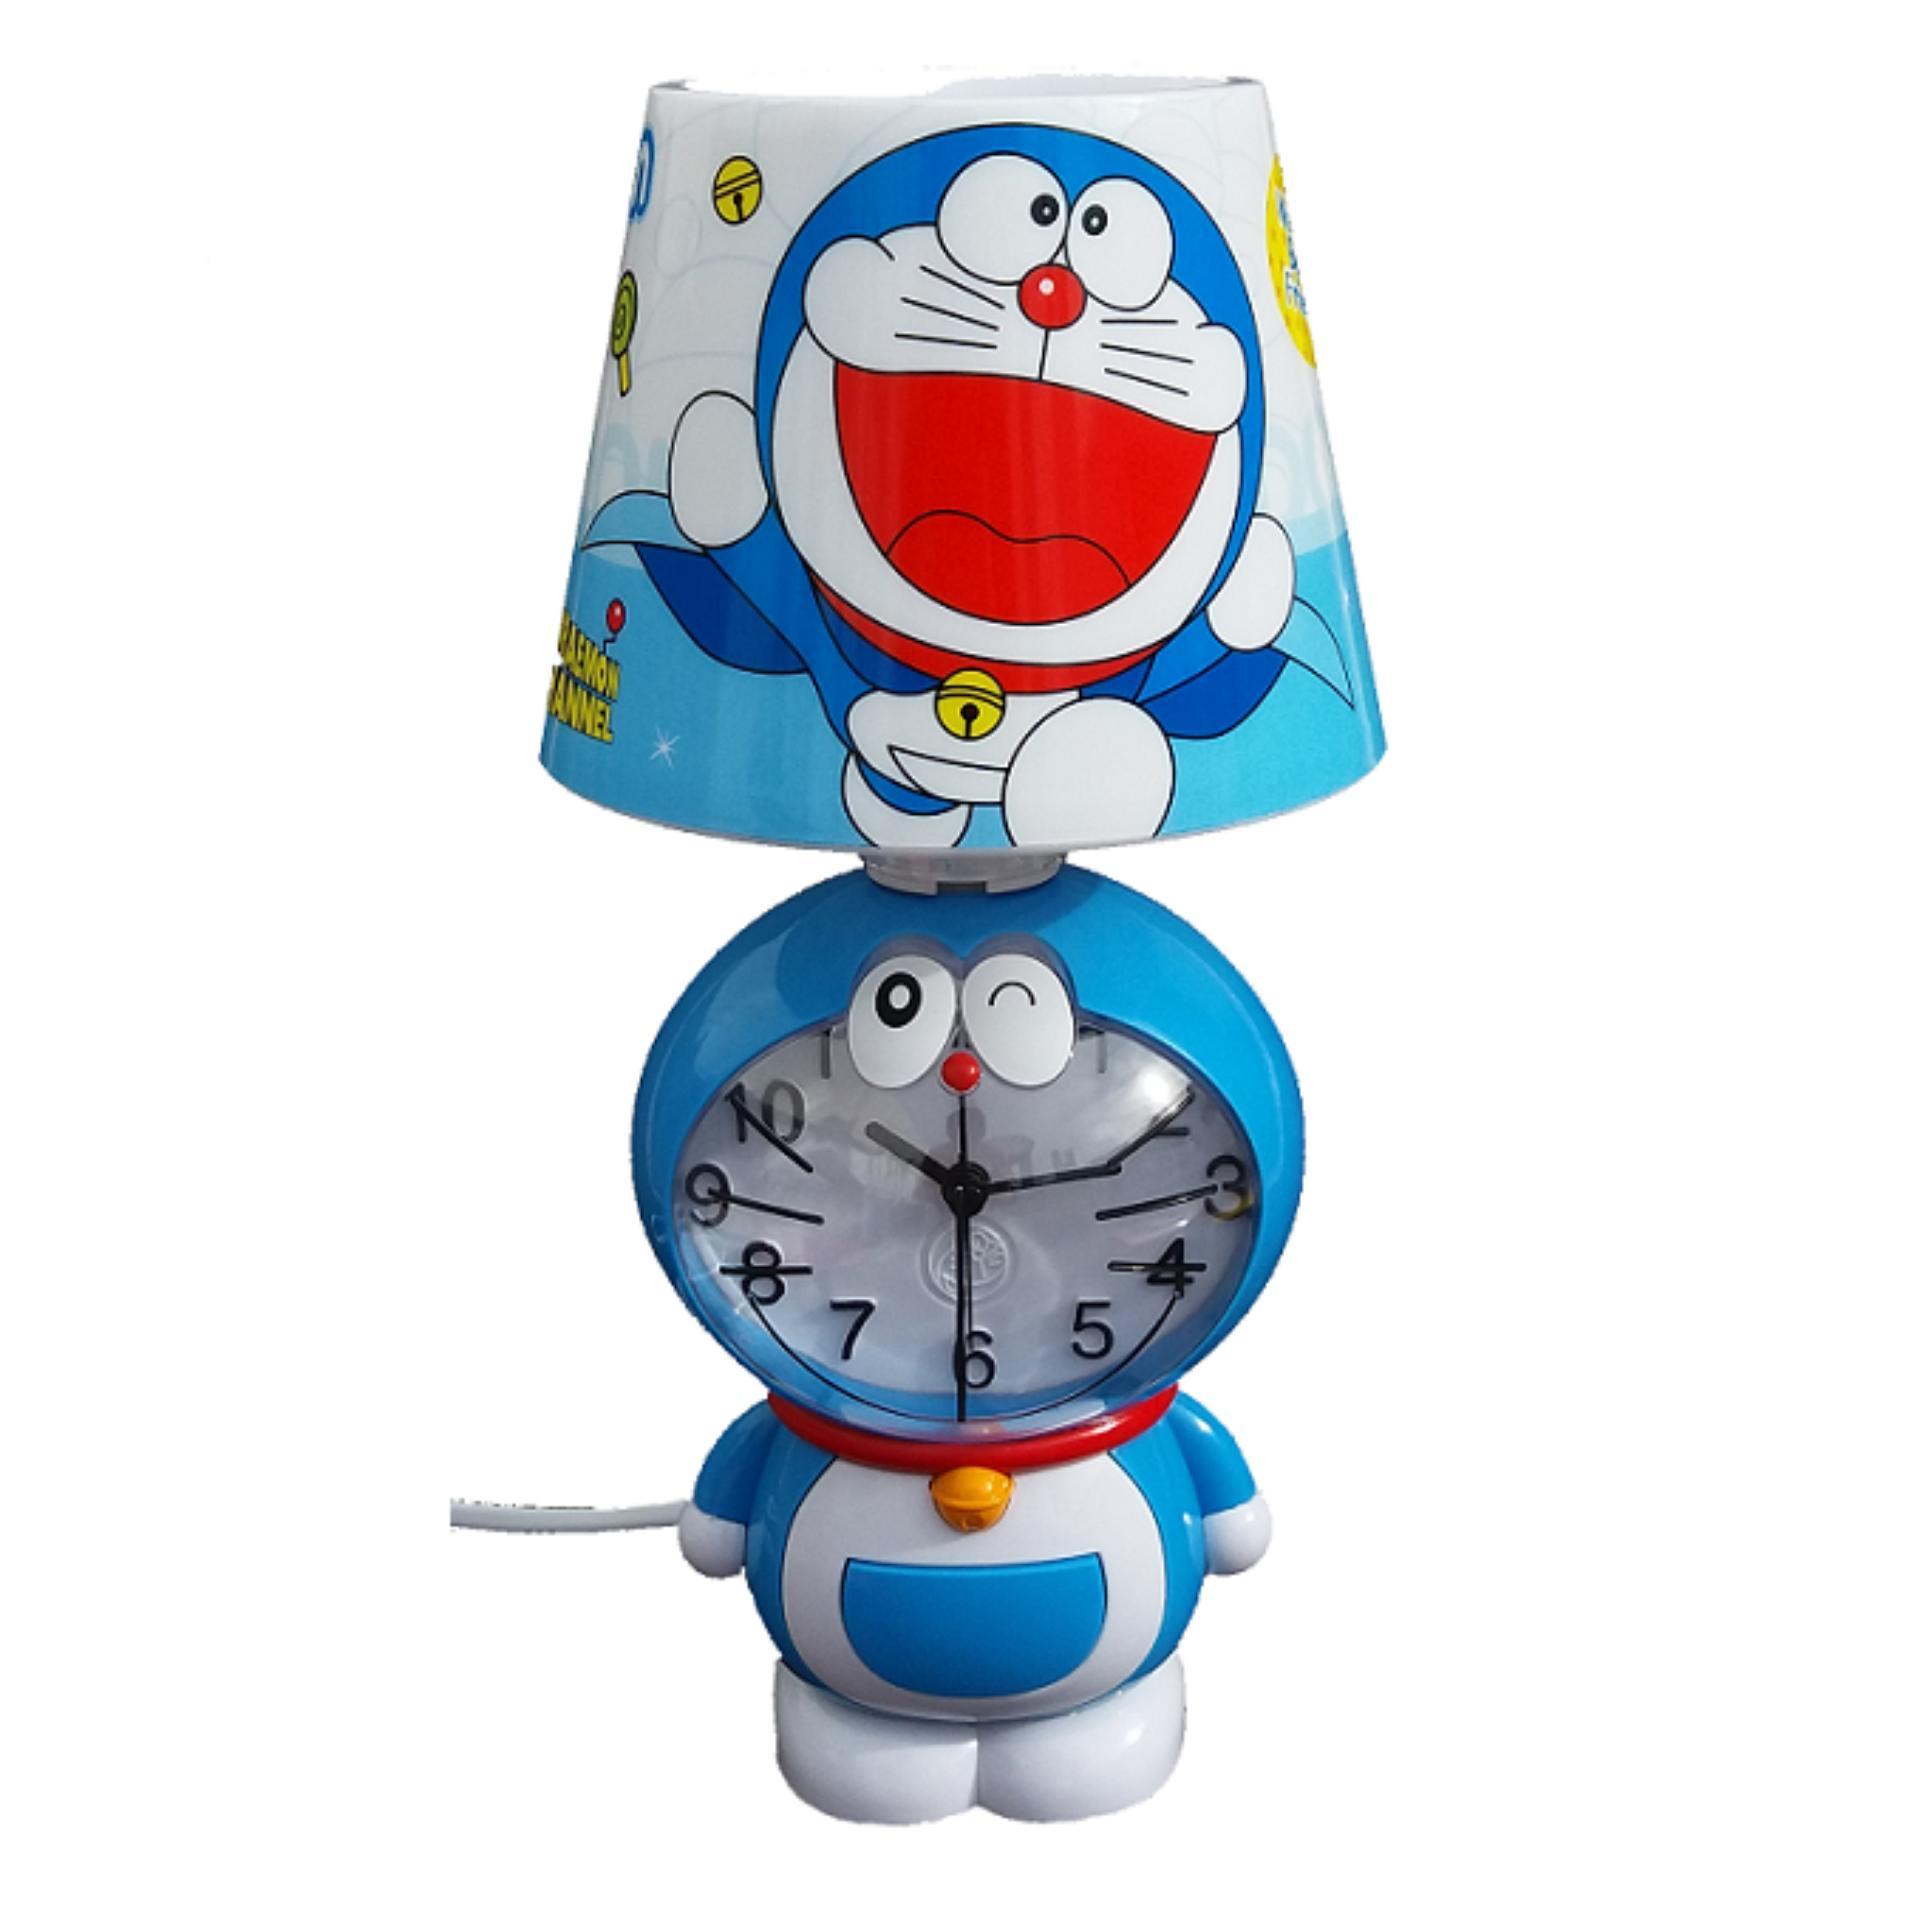 Doraemon Karakter Lampu (Jam) Meja CD-6782